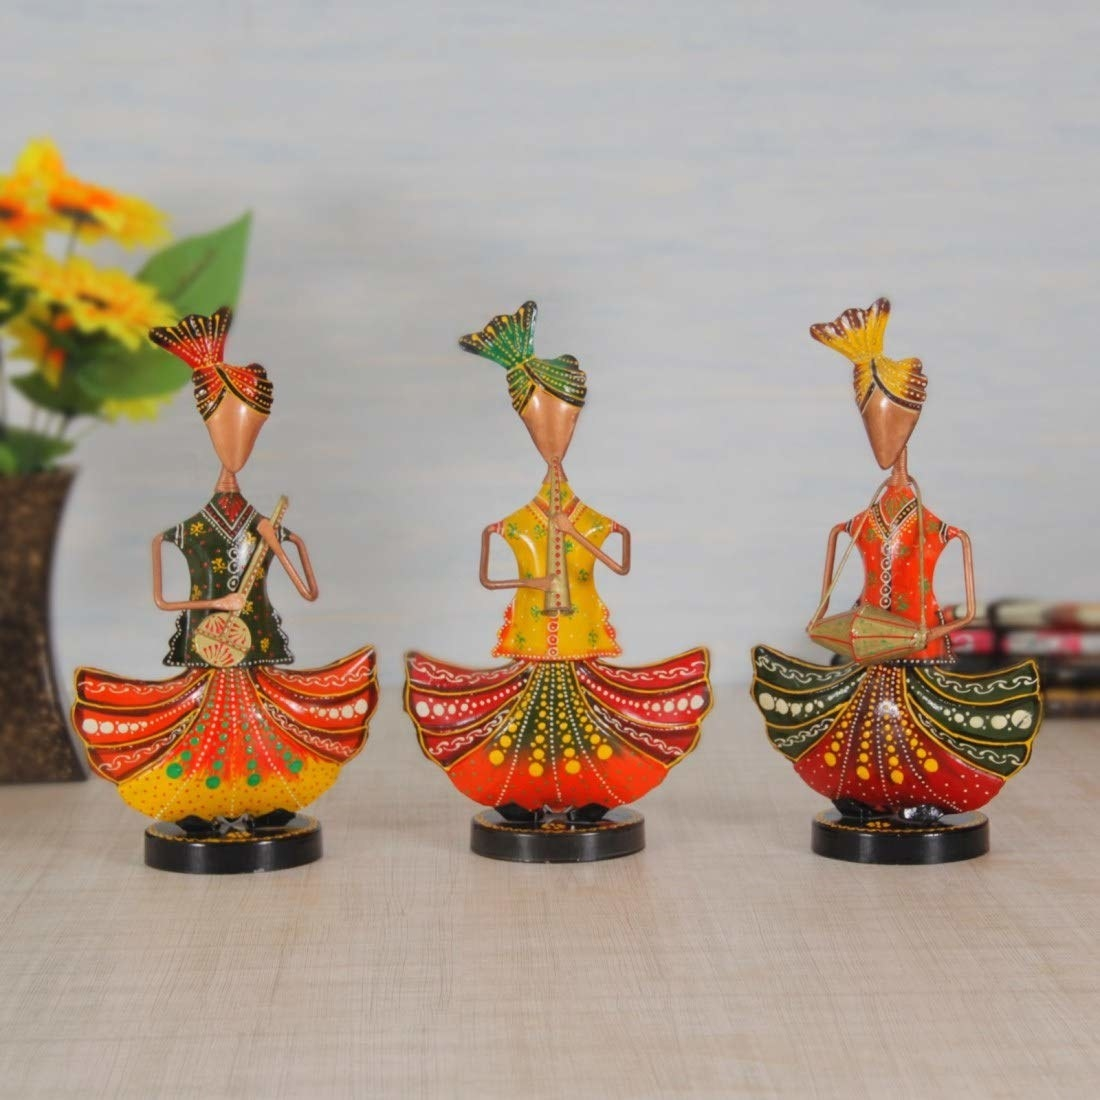 Rajasthani musician showpiece